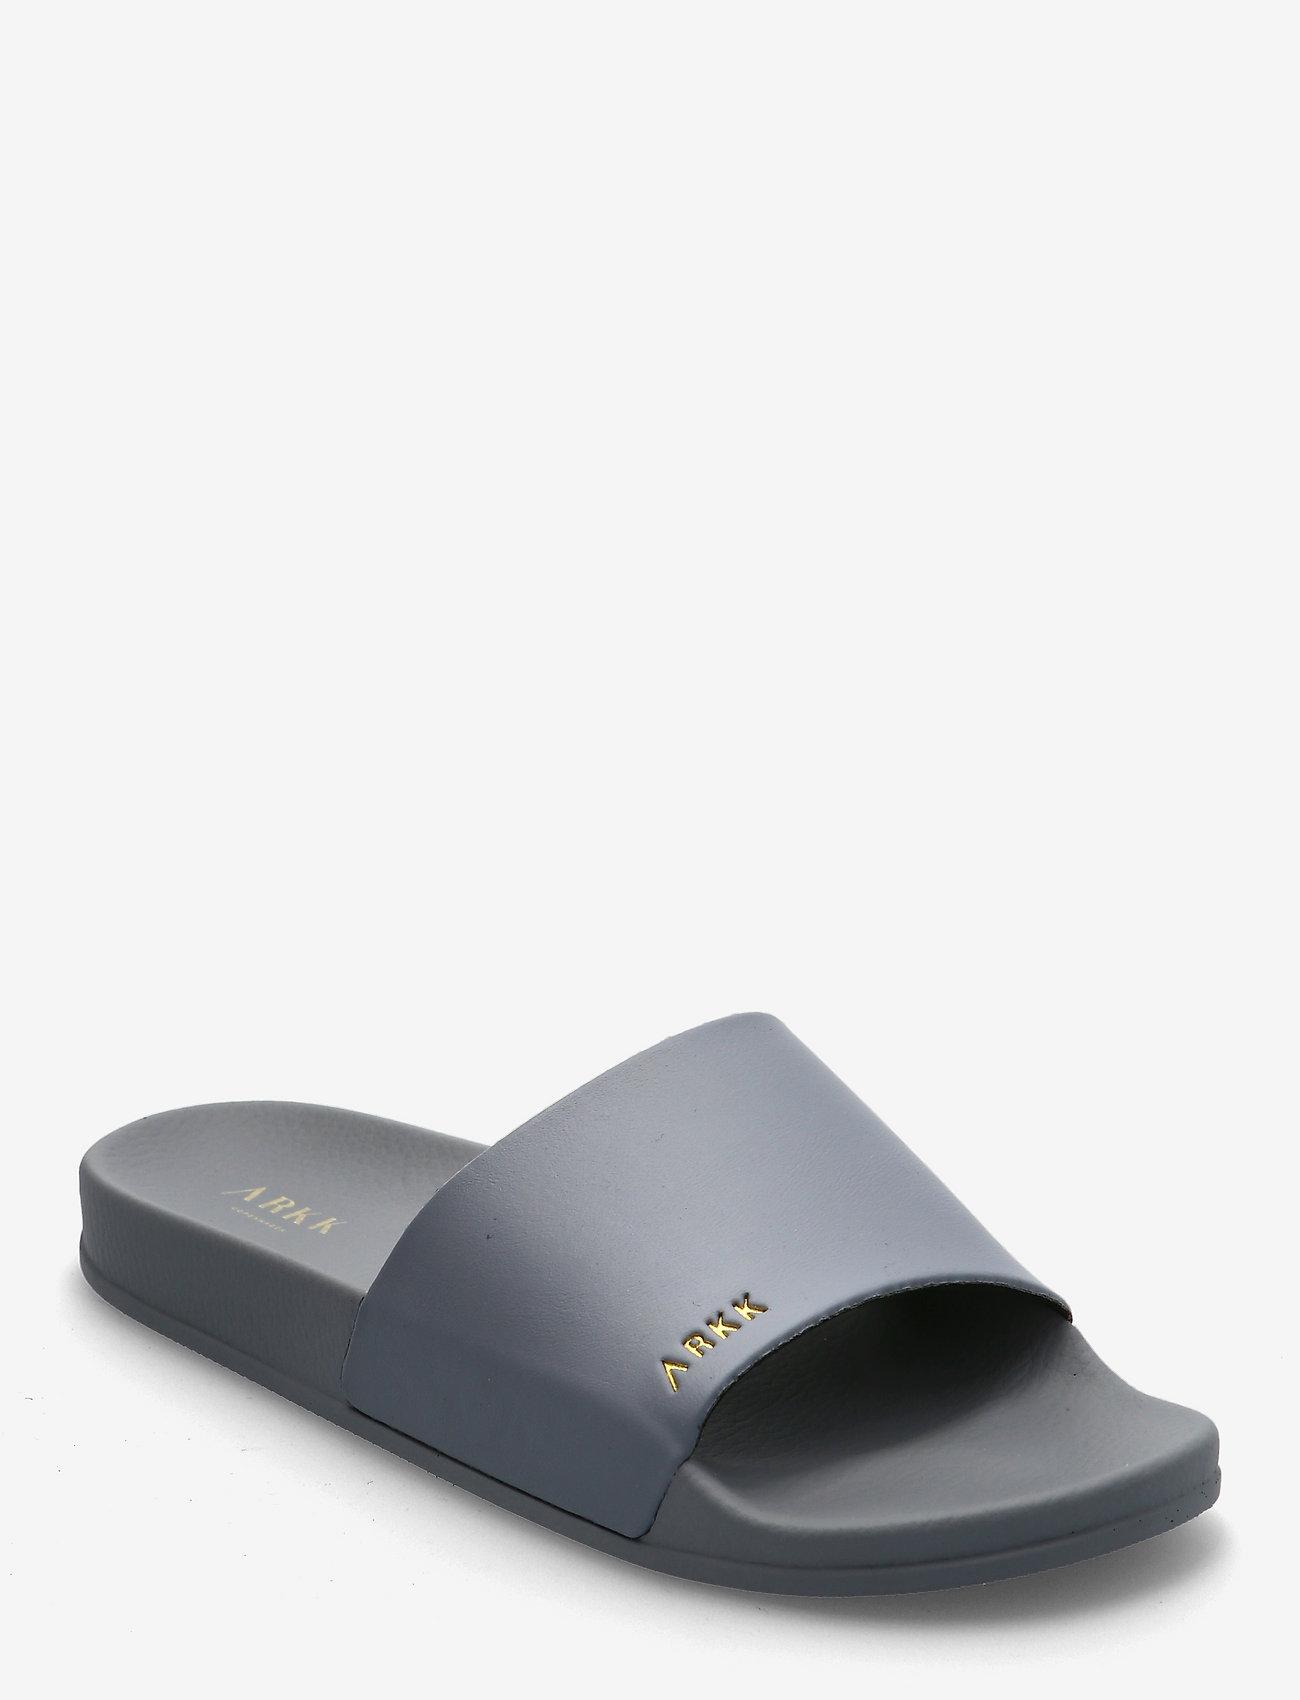 ARKK Copenhagen - ARKK Slides Premium Grey - Men - pool sliders - grey - 0